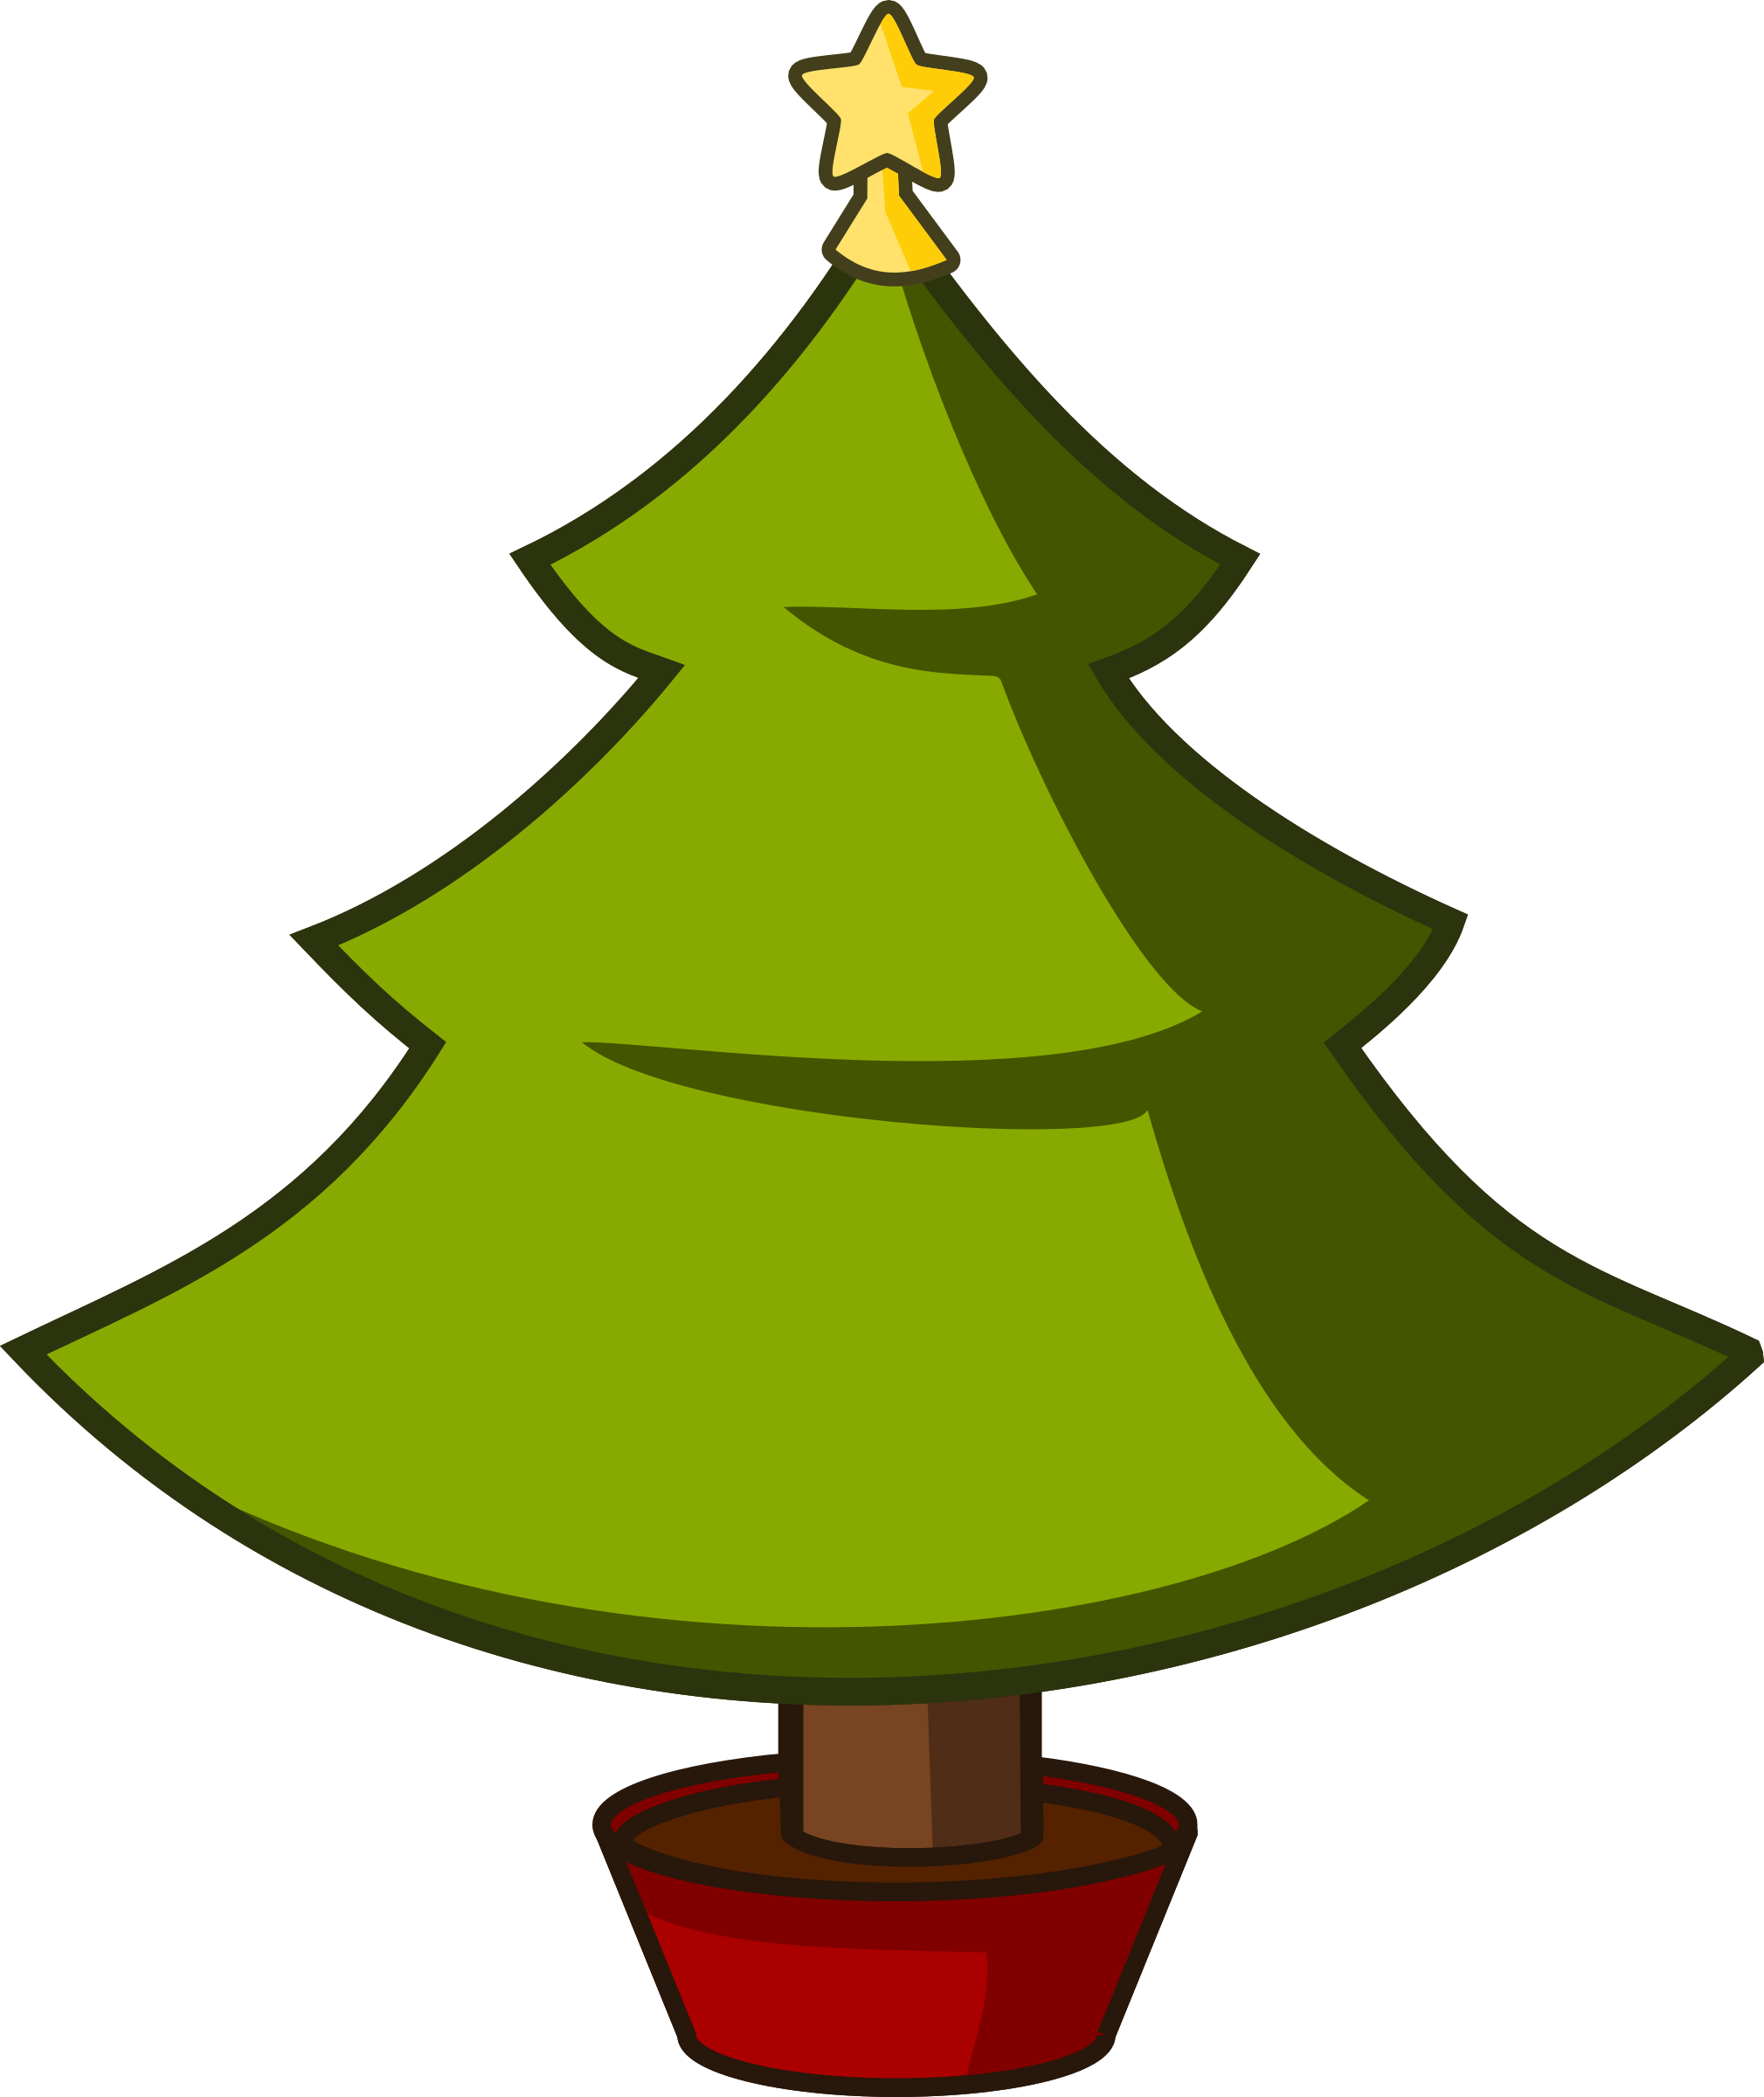 Cartoon Christmas Tree - ClipArt Best